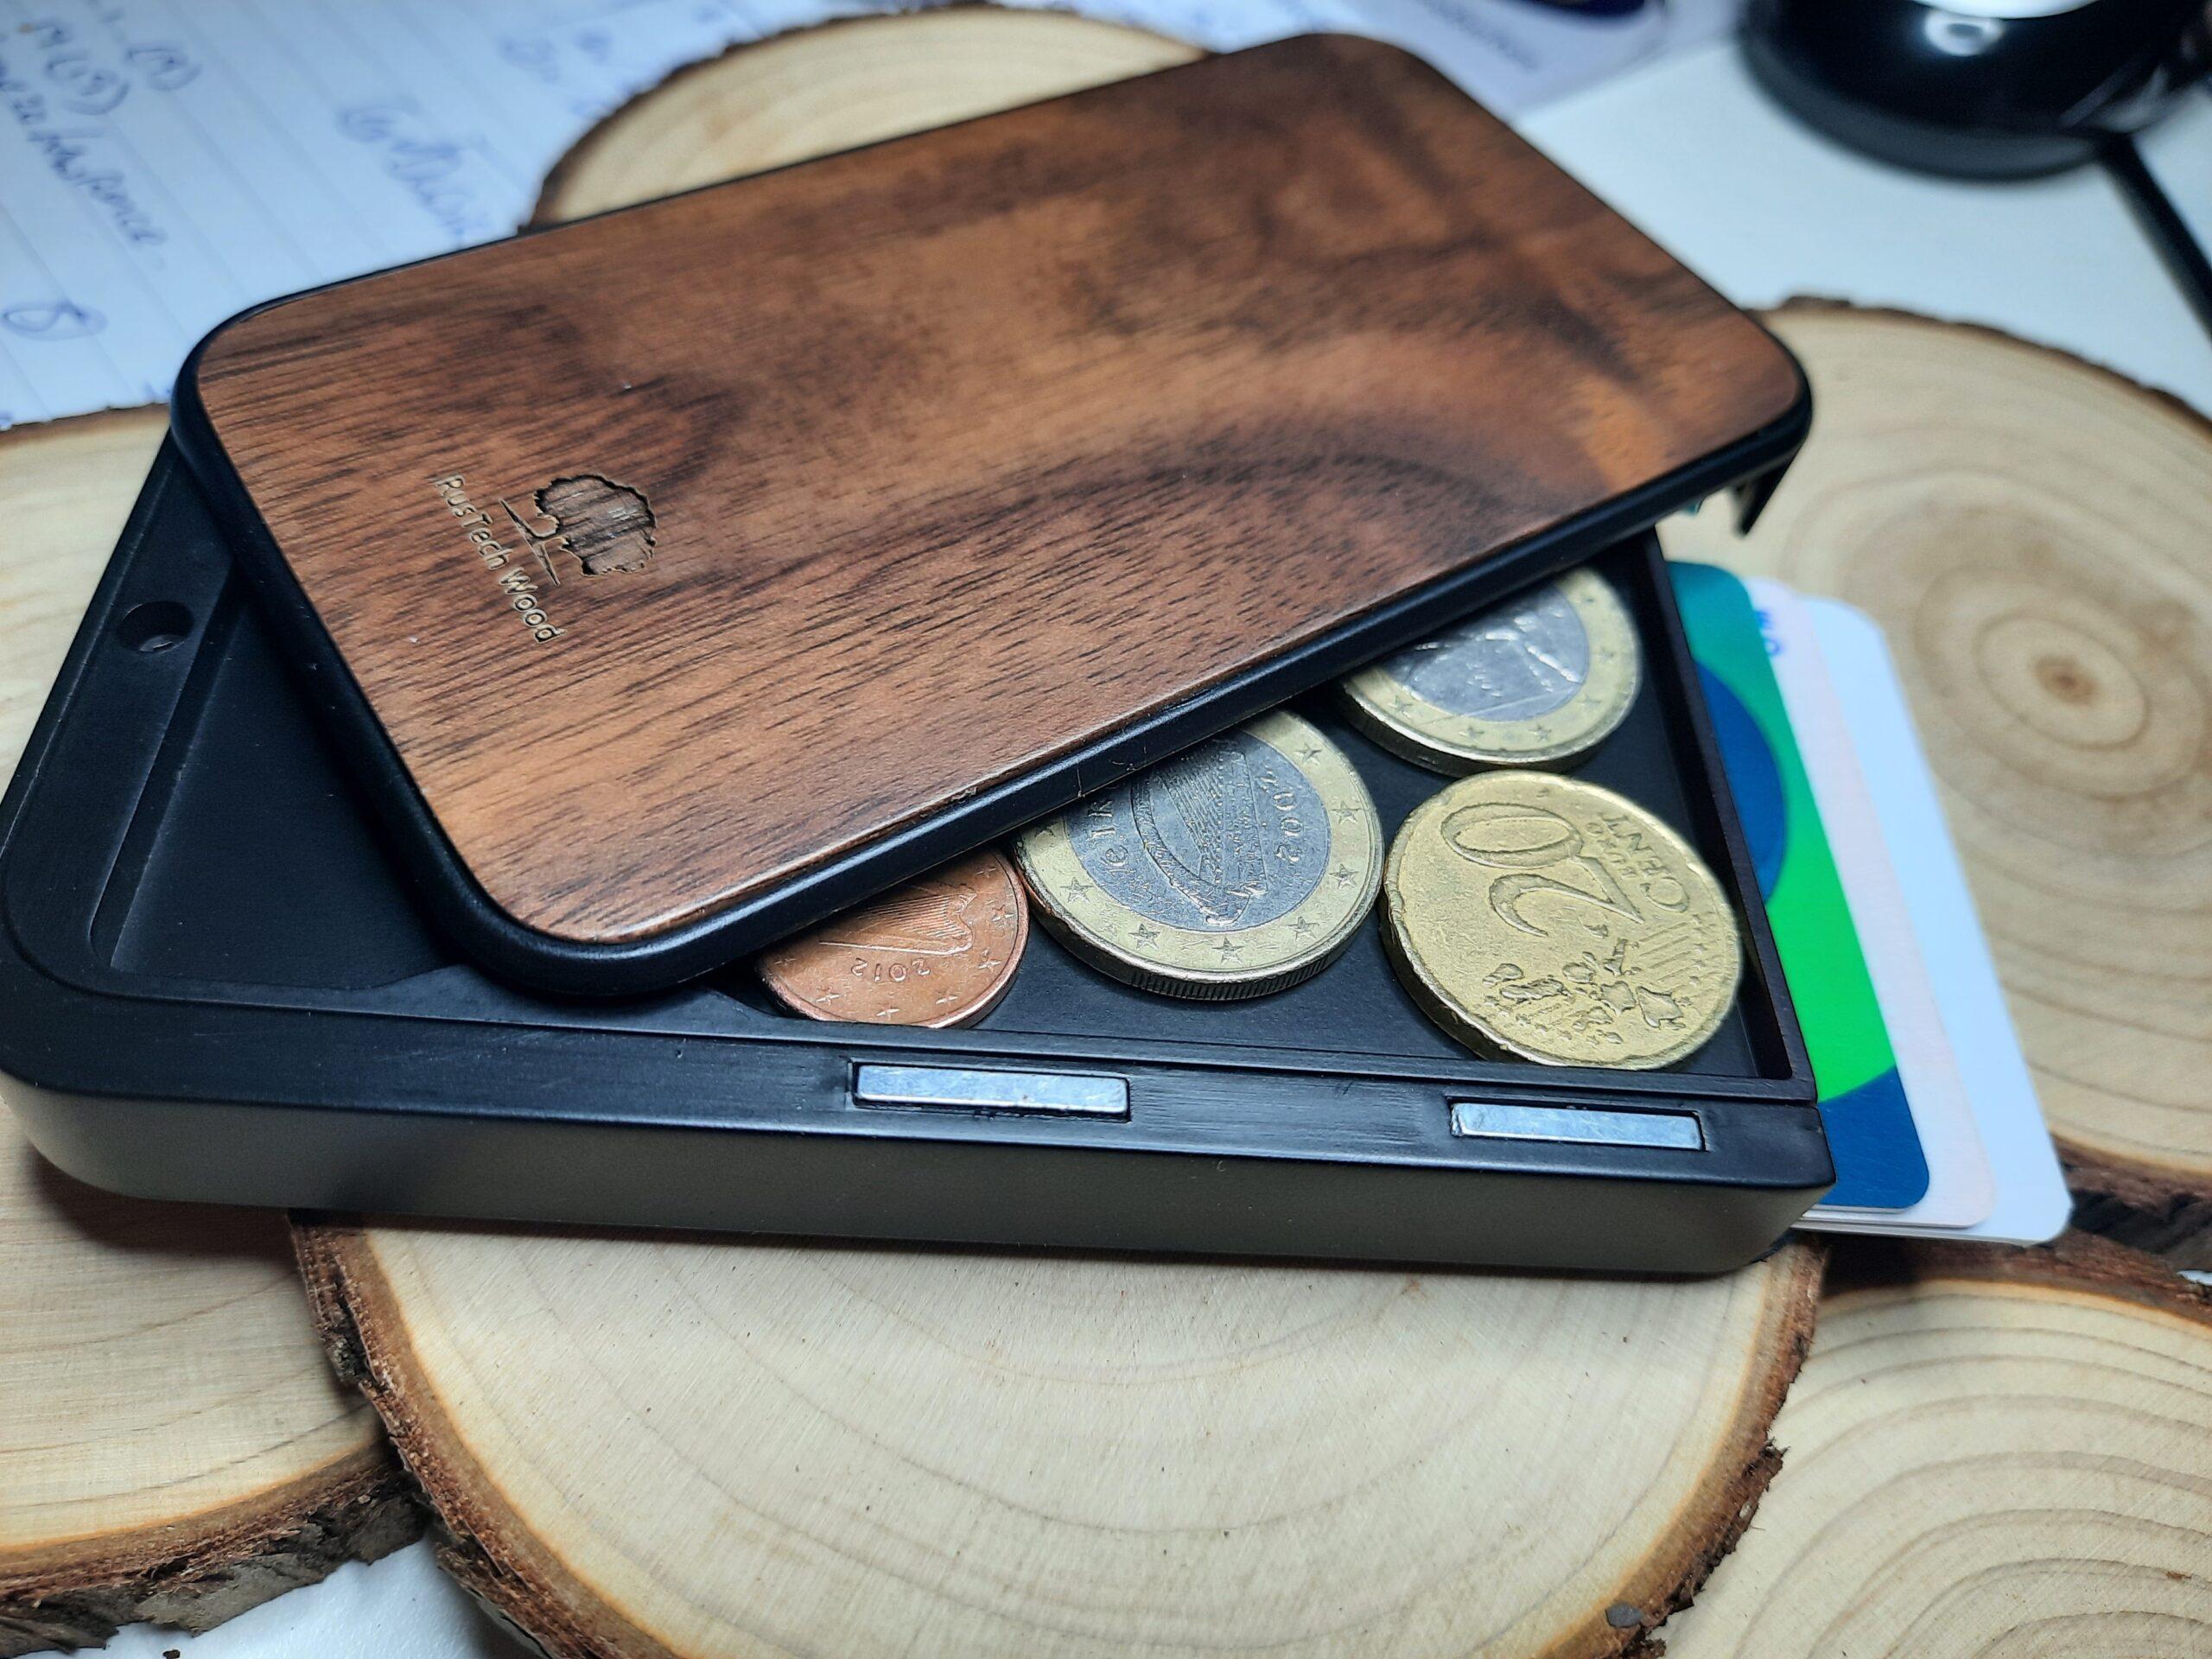 rfid card holder wallet